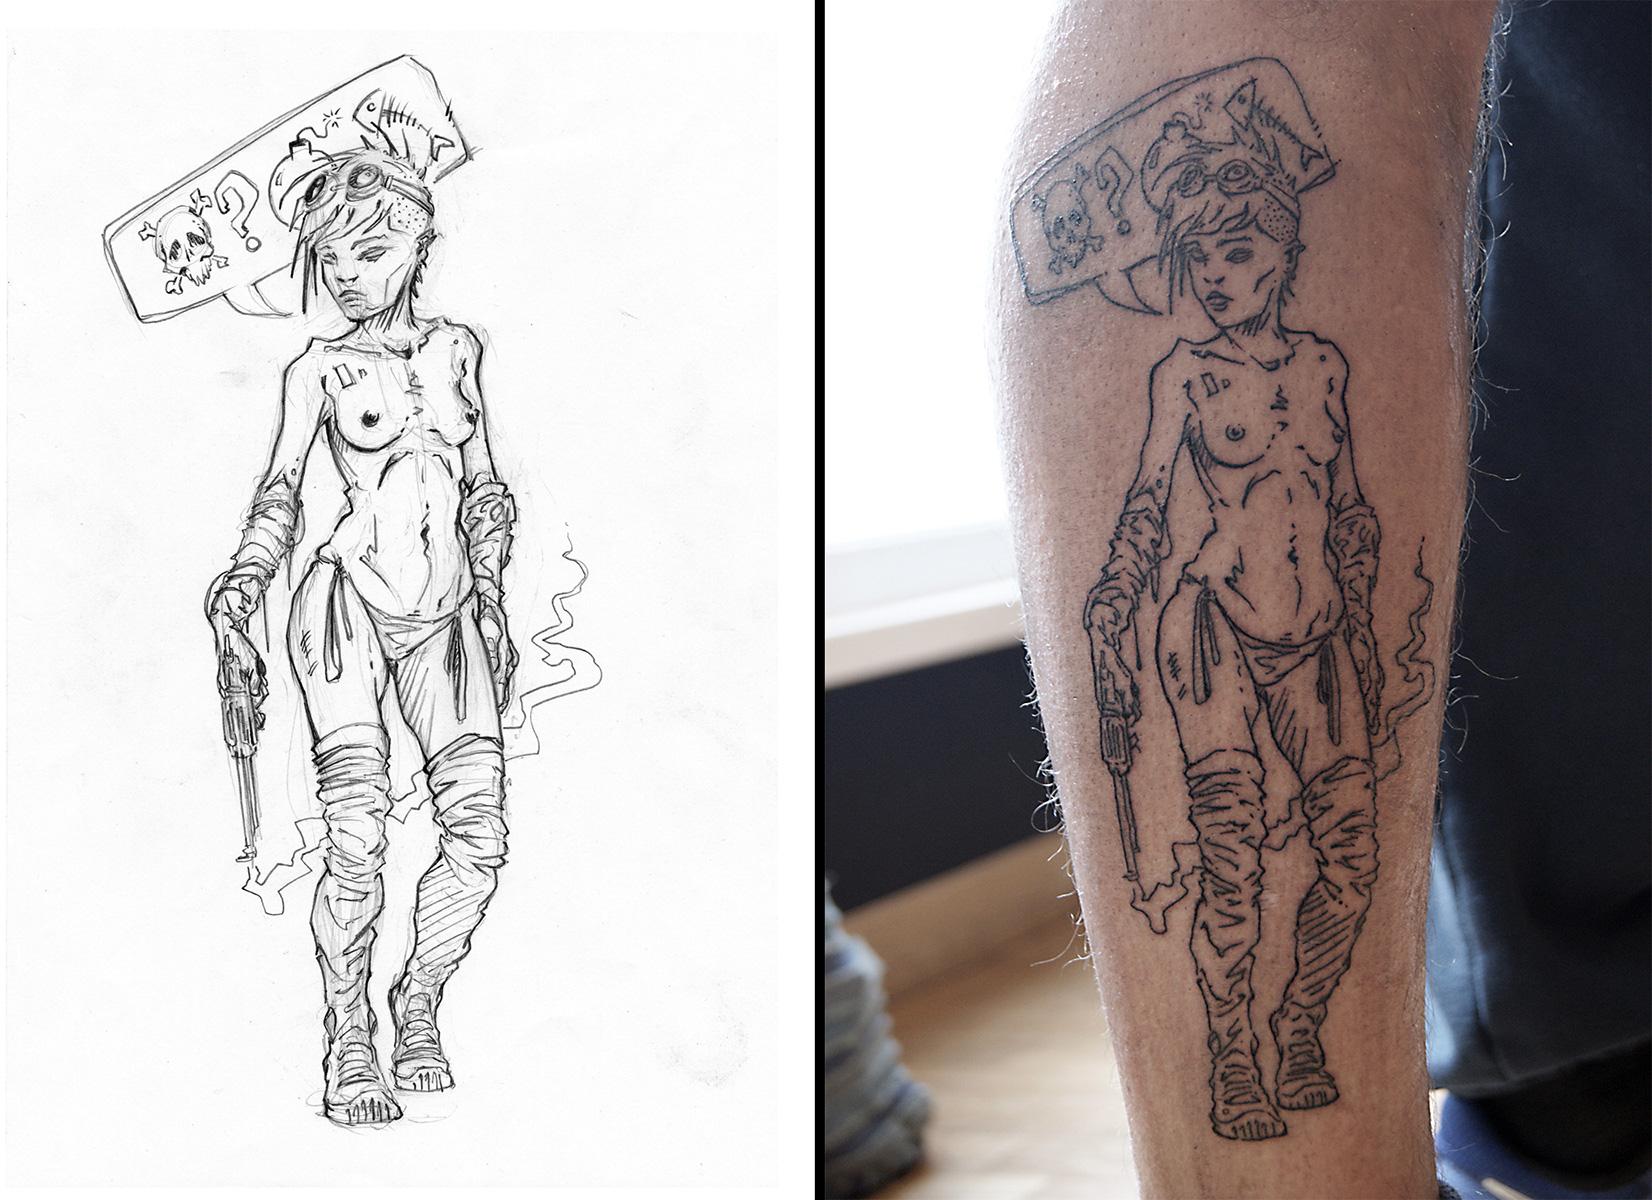 DeodatusDesign_Punk_Girl_Tattoo_2016